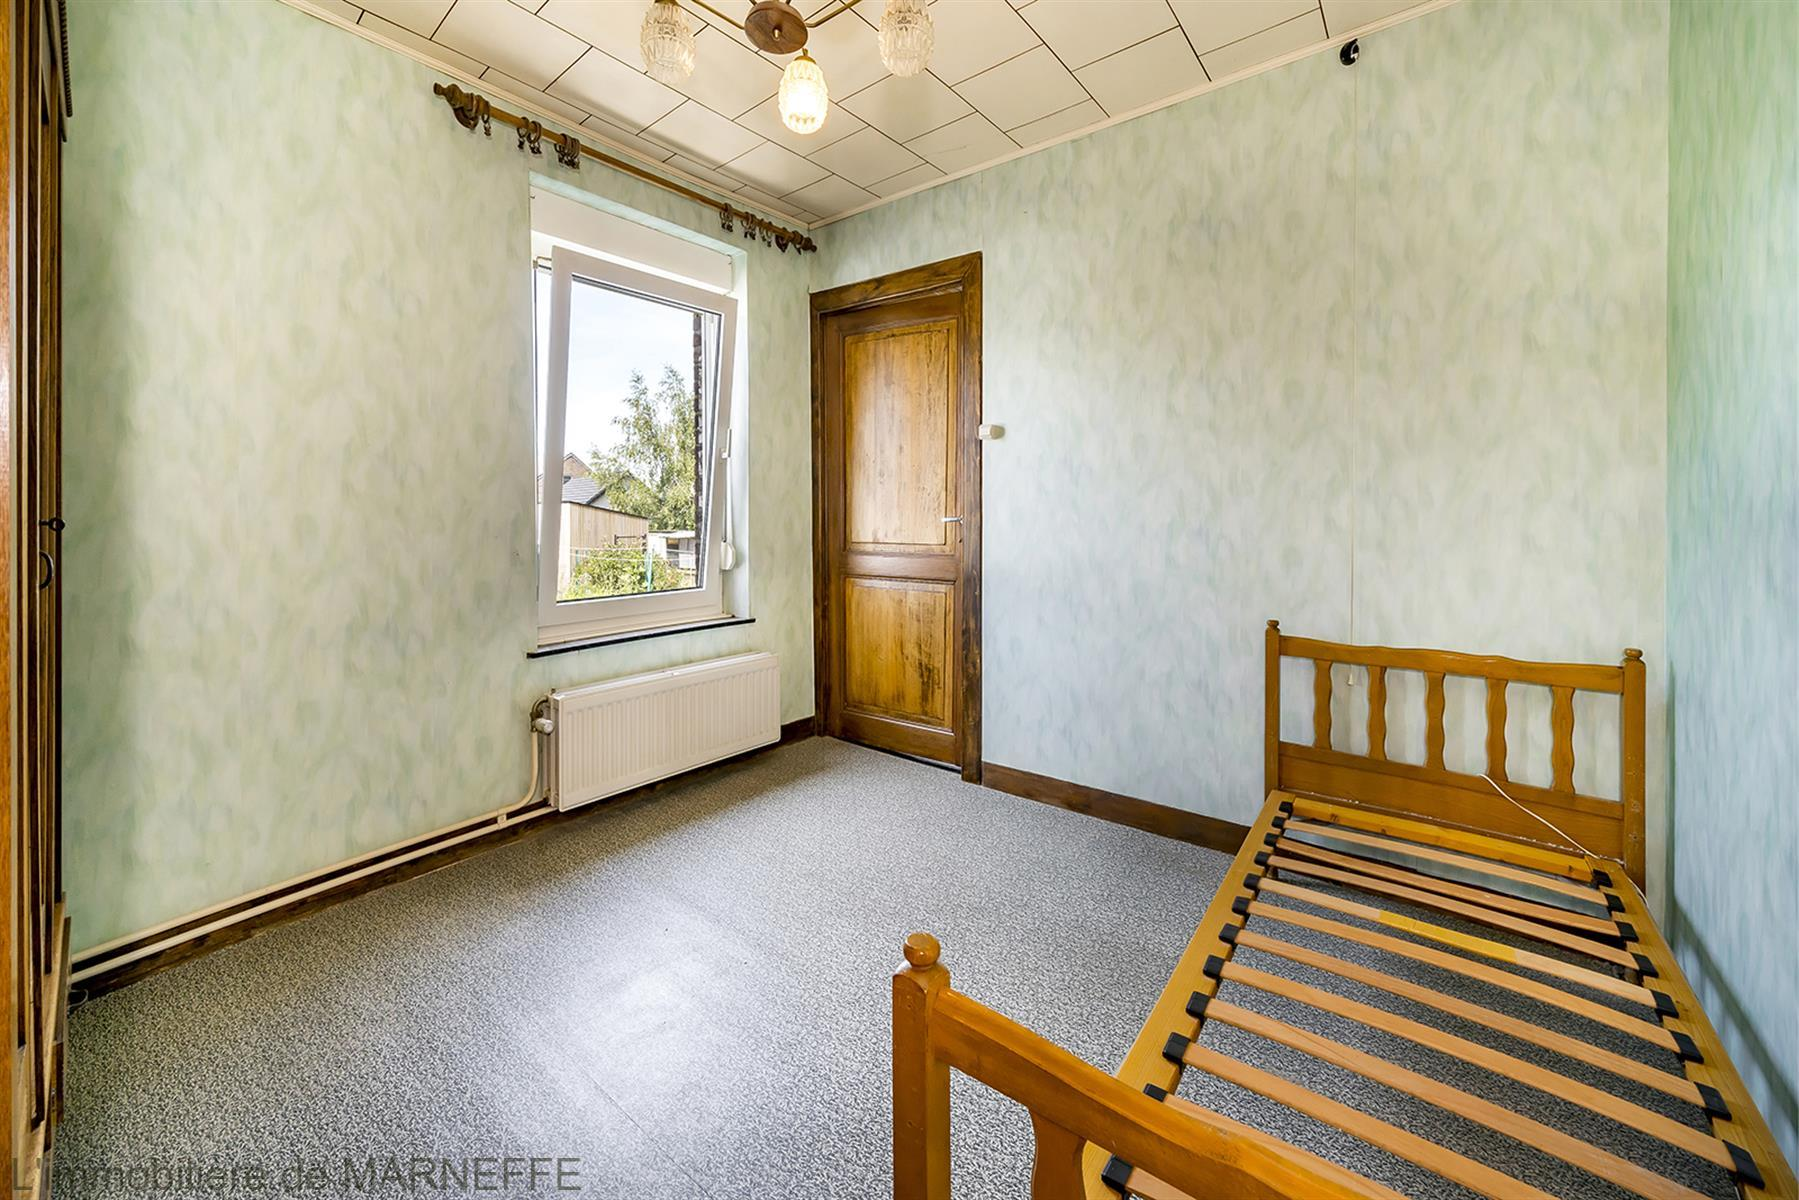 Maison - Remicourt - #3801531-13